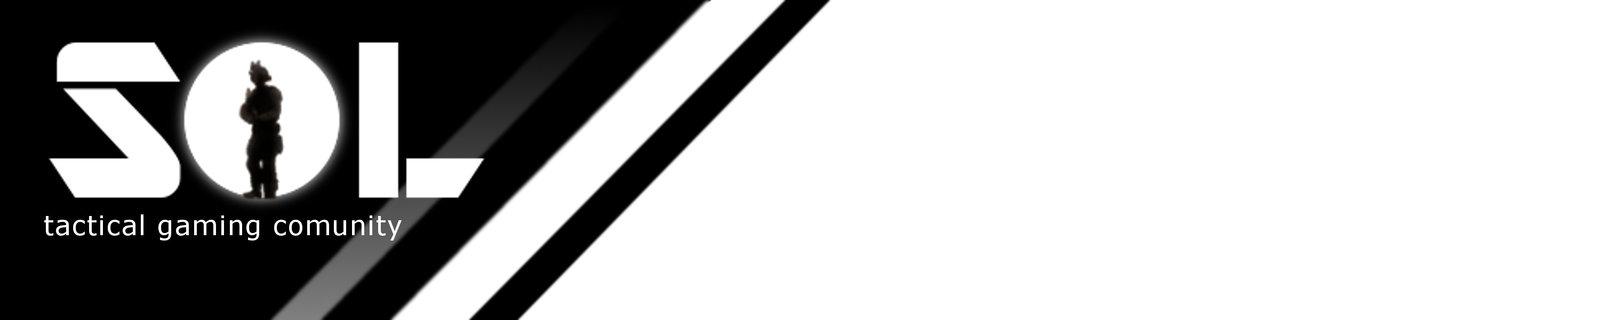 schwarz.jpg